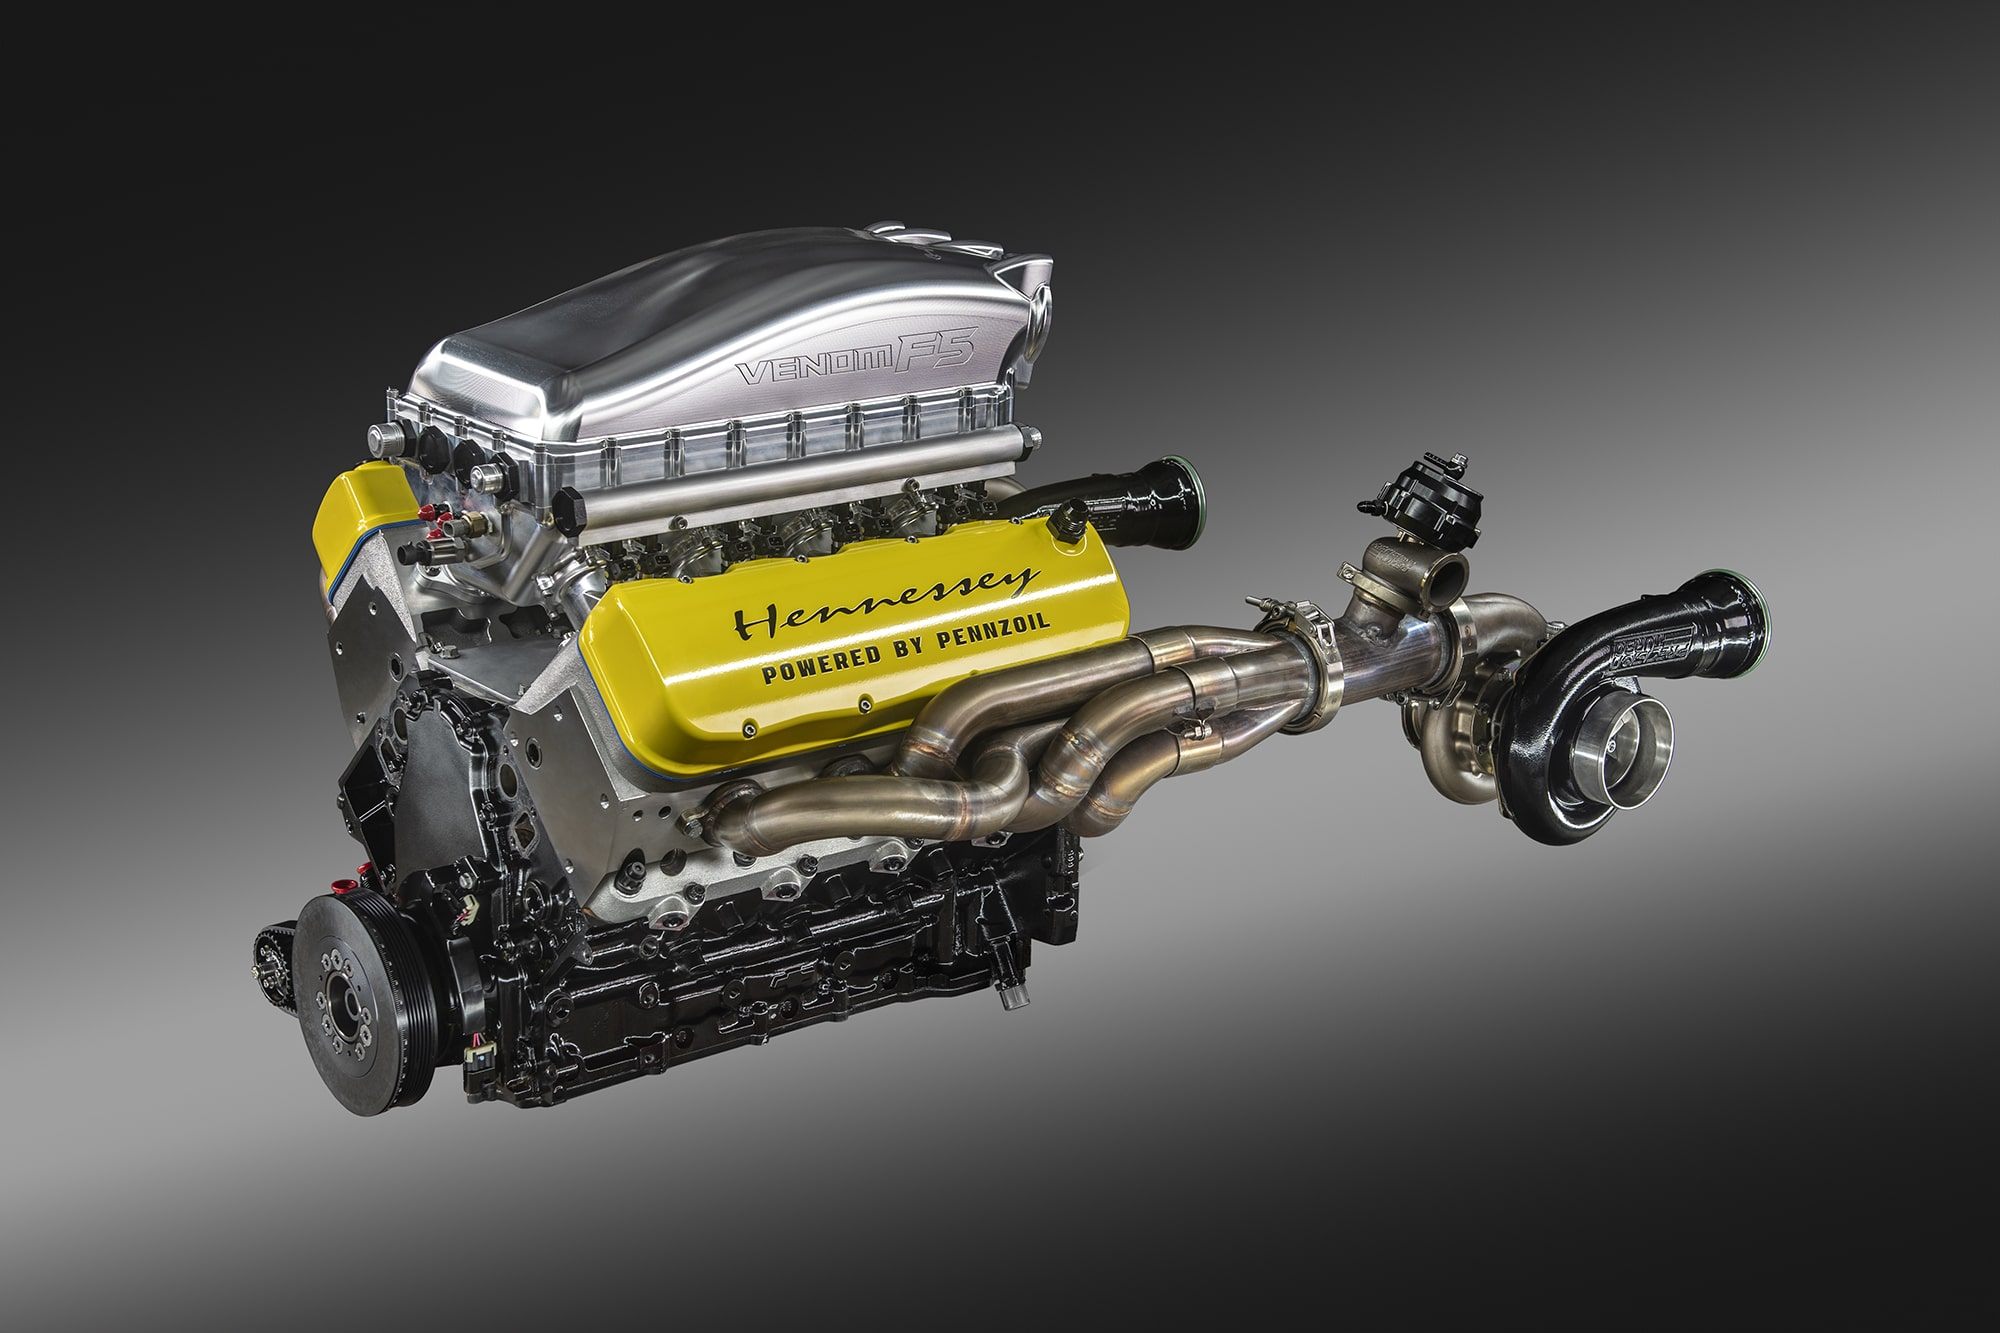 Hennessey Venom F5 1817hp 2019 Venom-F5-Engine-Fury-2-min